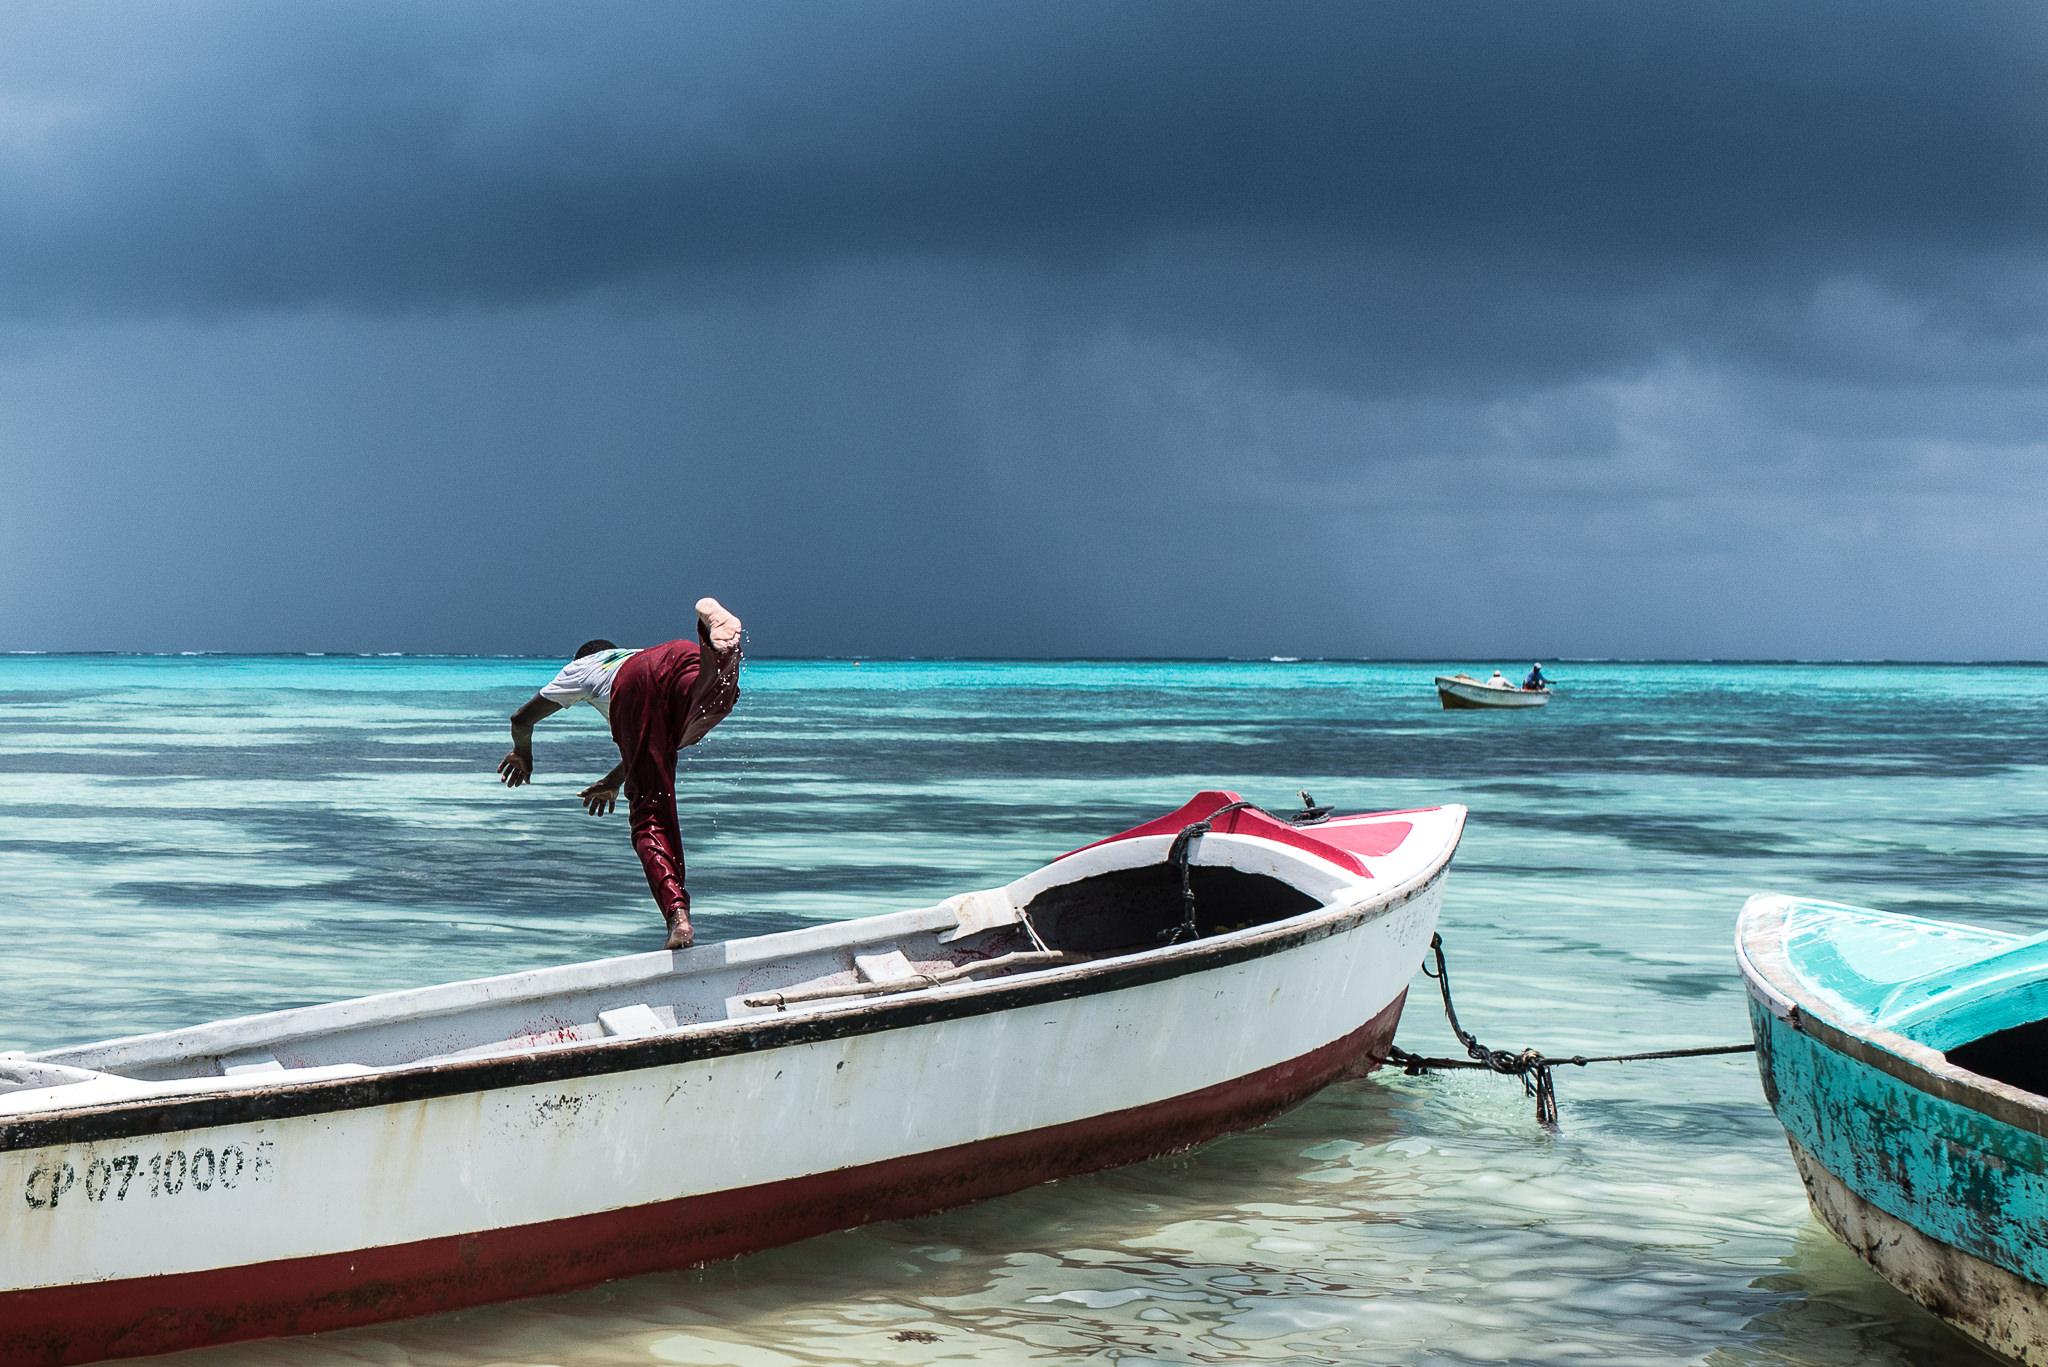 barco_sai_sanandres_colombia_caribe_fisherman_haya_sky_blue_isla_island_00010.jpg